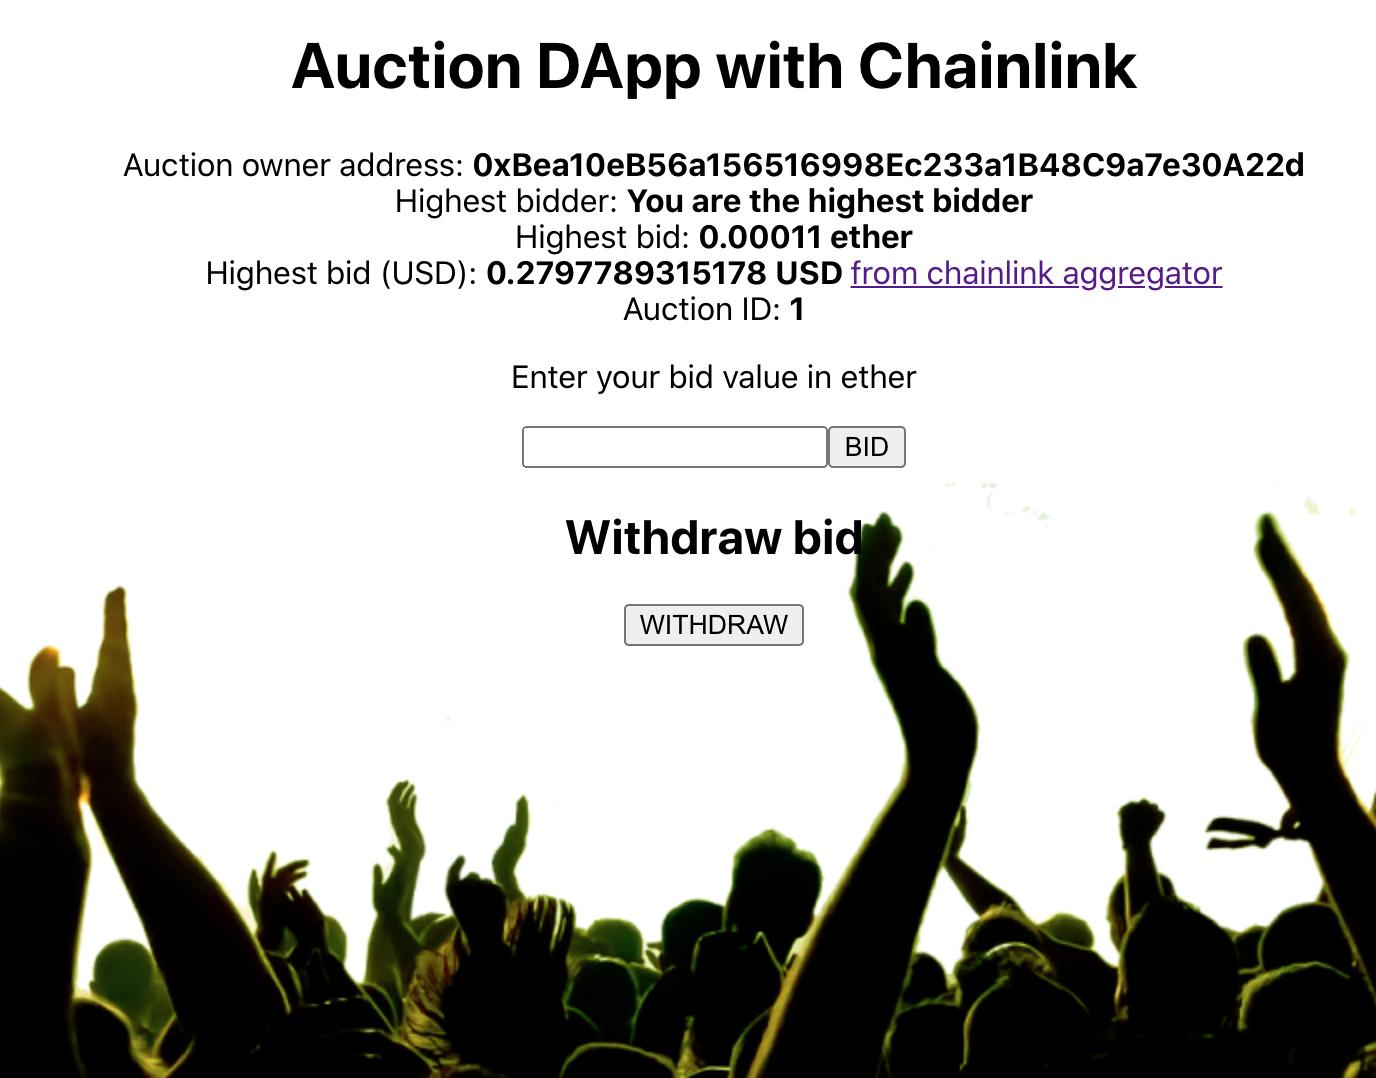 Auction Dapp with Chainlink - 带链接的拍卖Dapp